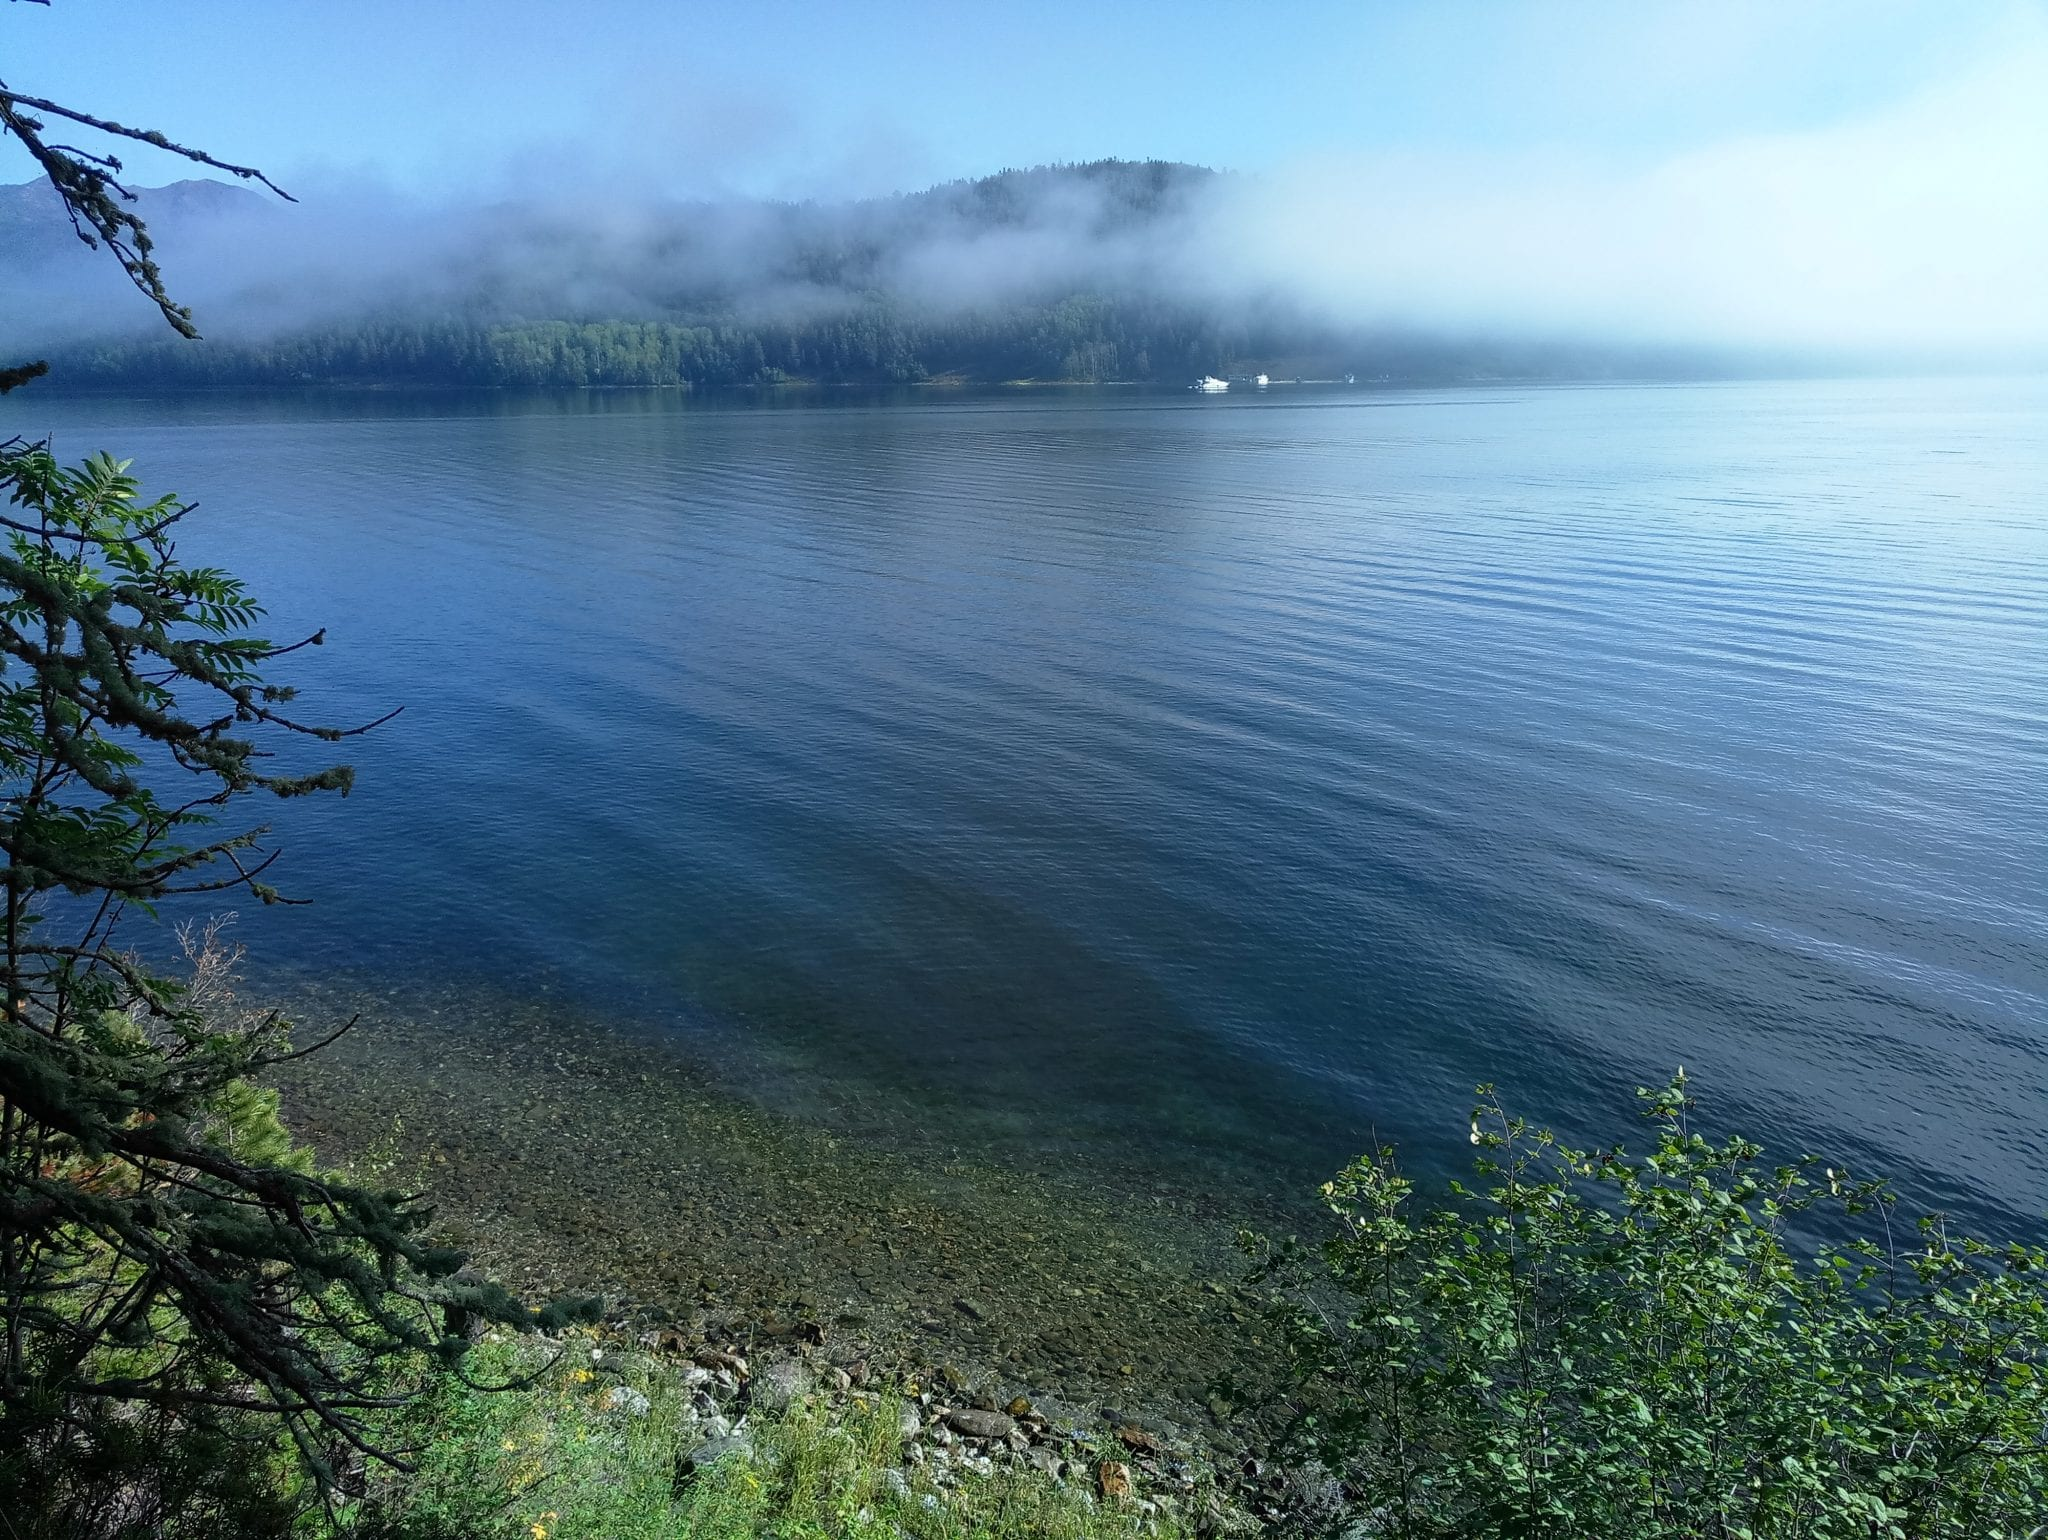 Blue water of the Lake Baikal